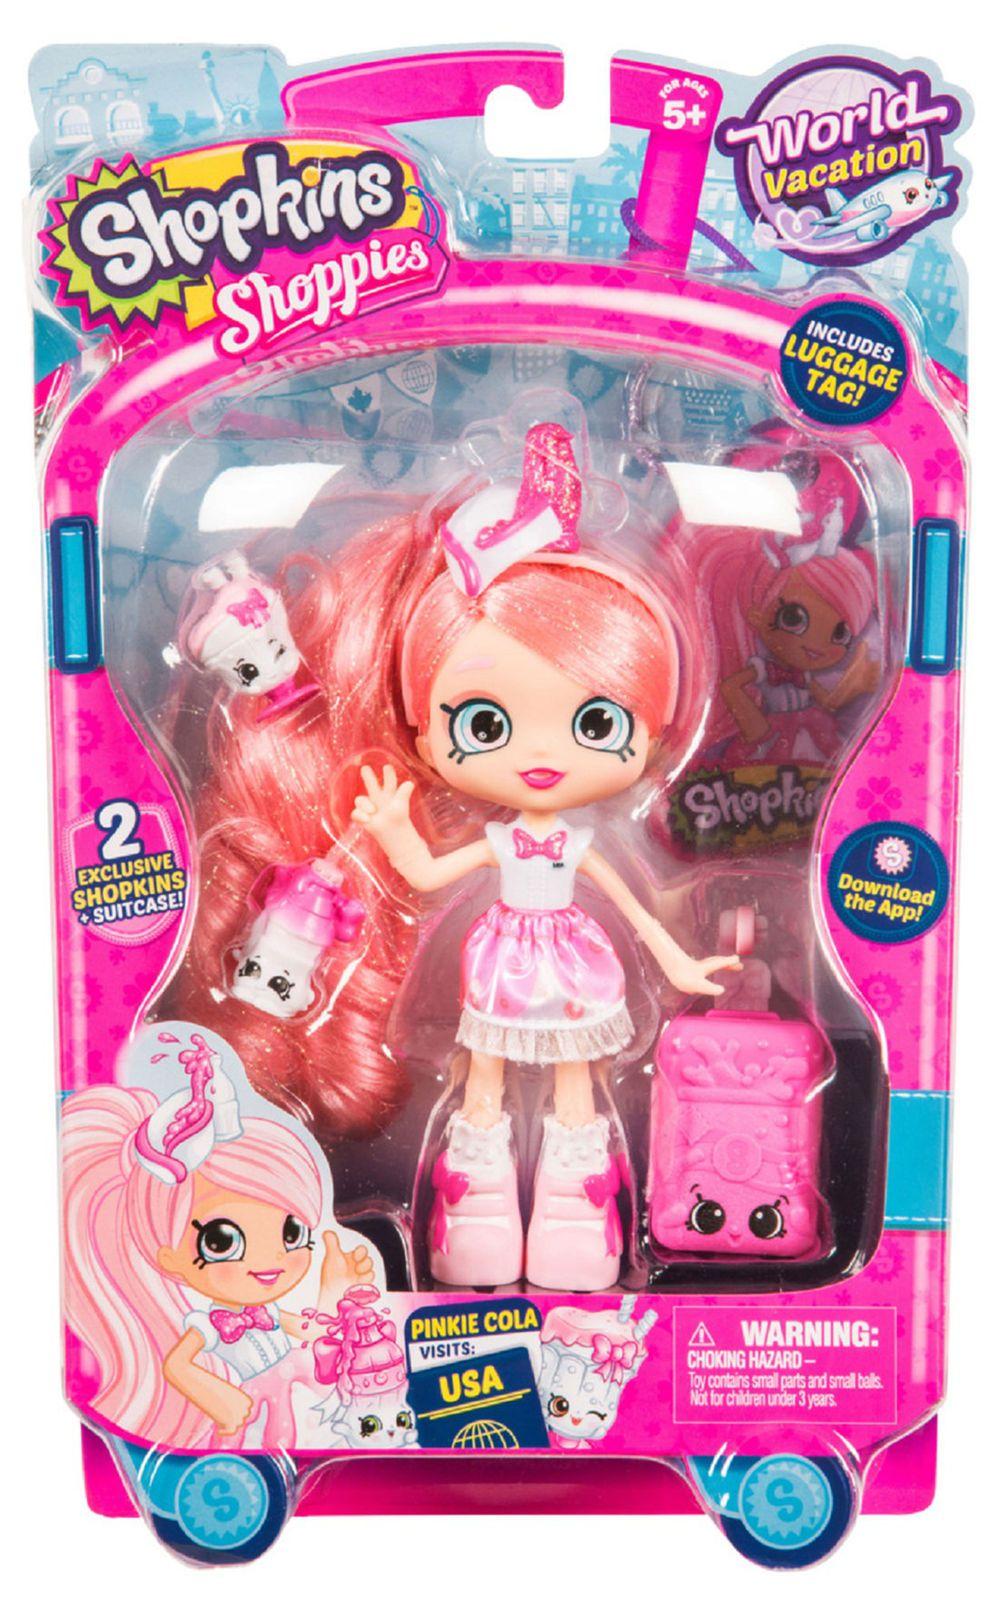 Shopkins Shoppies World Vacation Visits America Doll